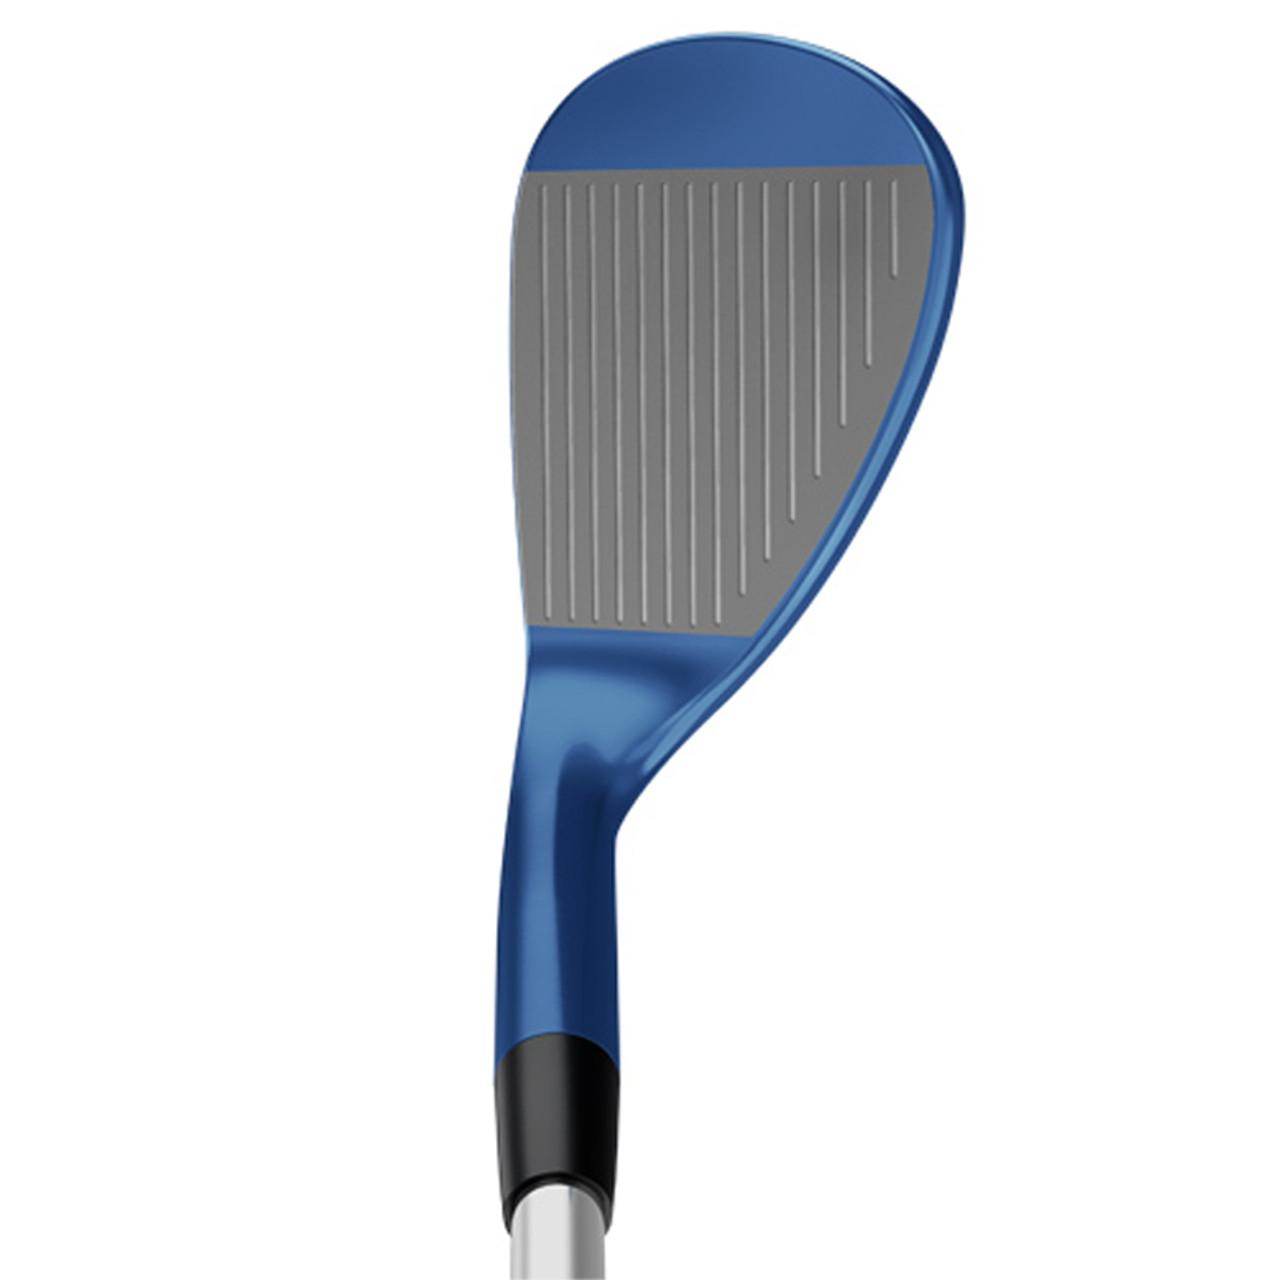 Mizuno S18 Blue Ion Wedges